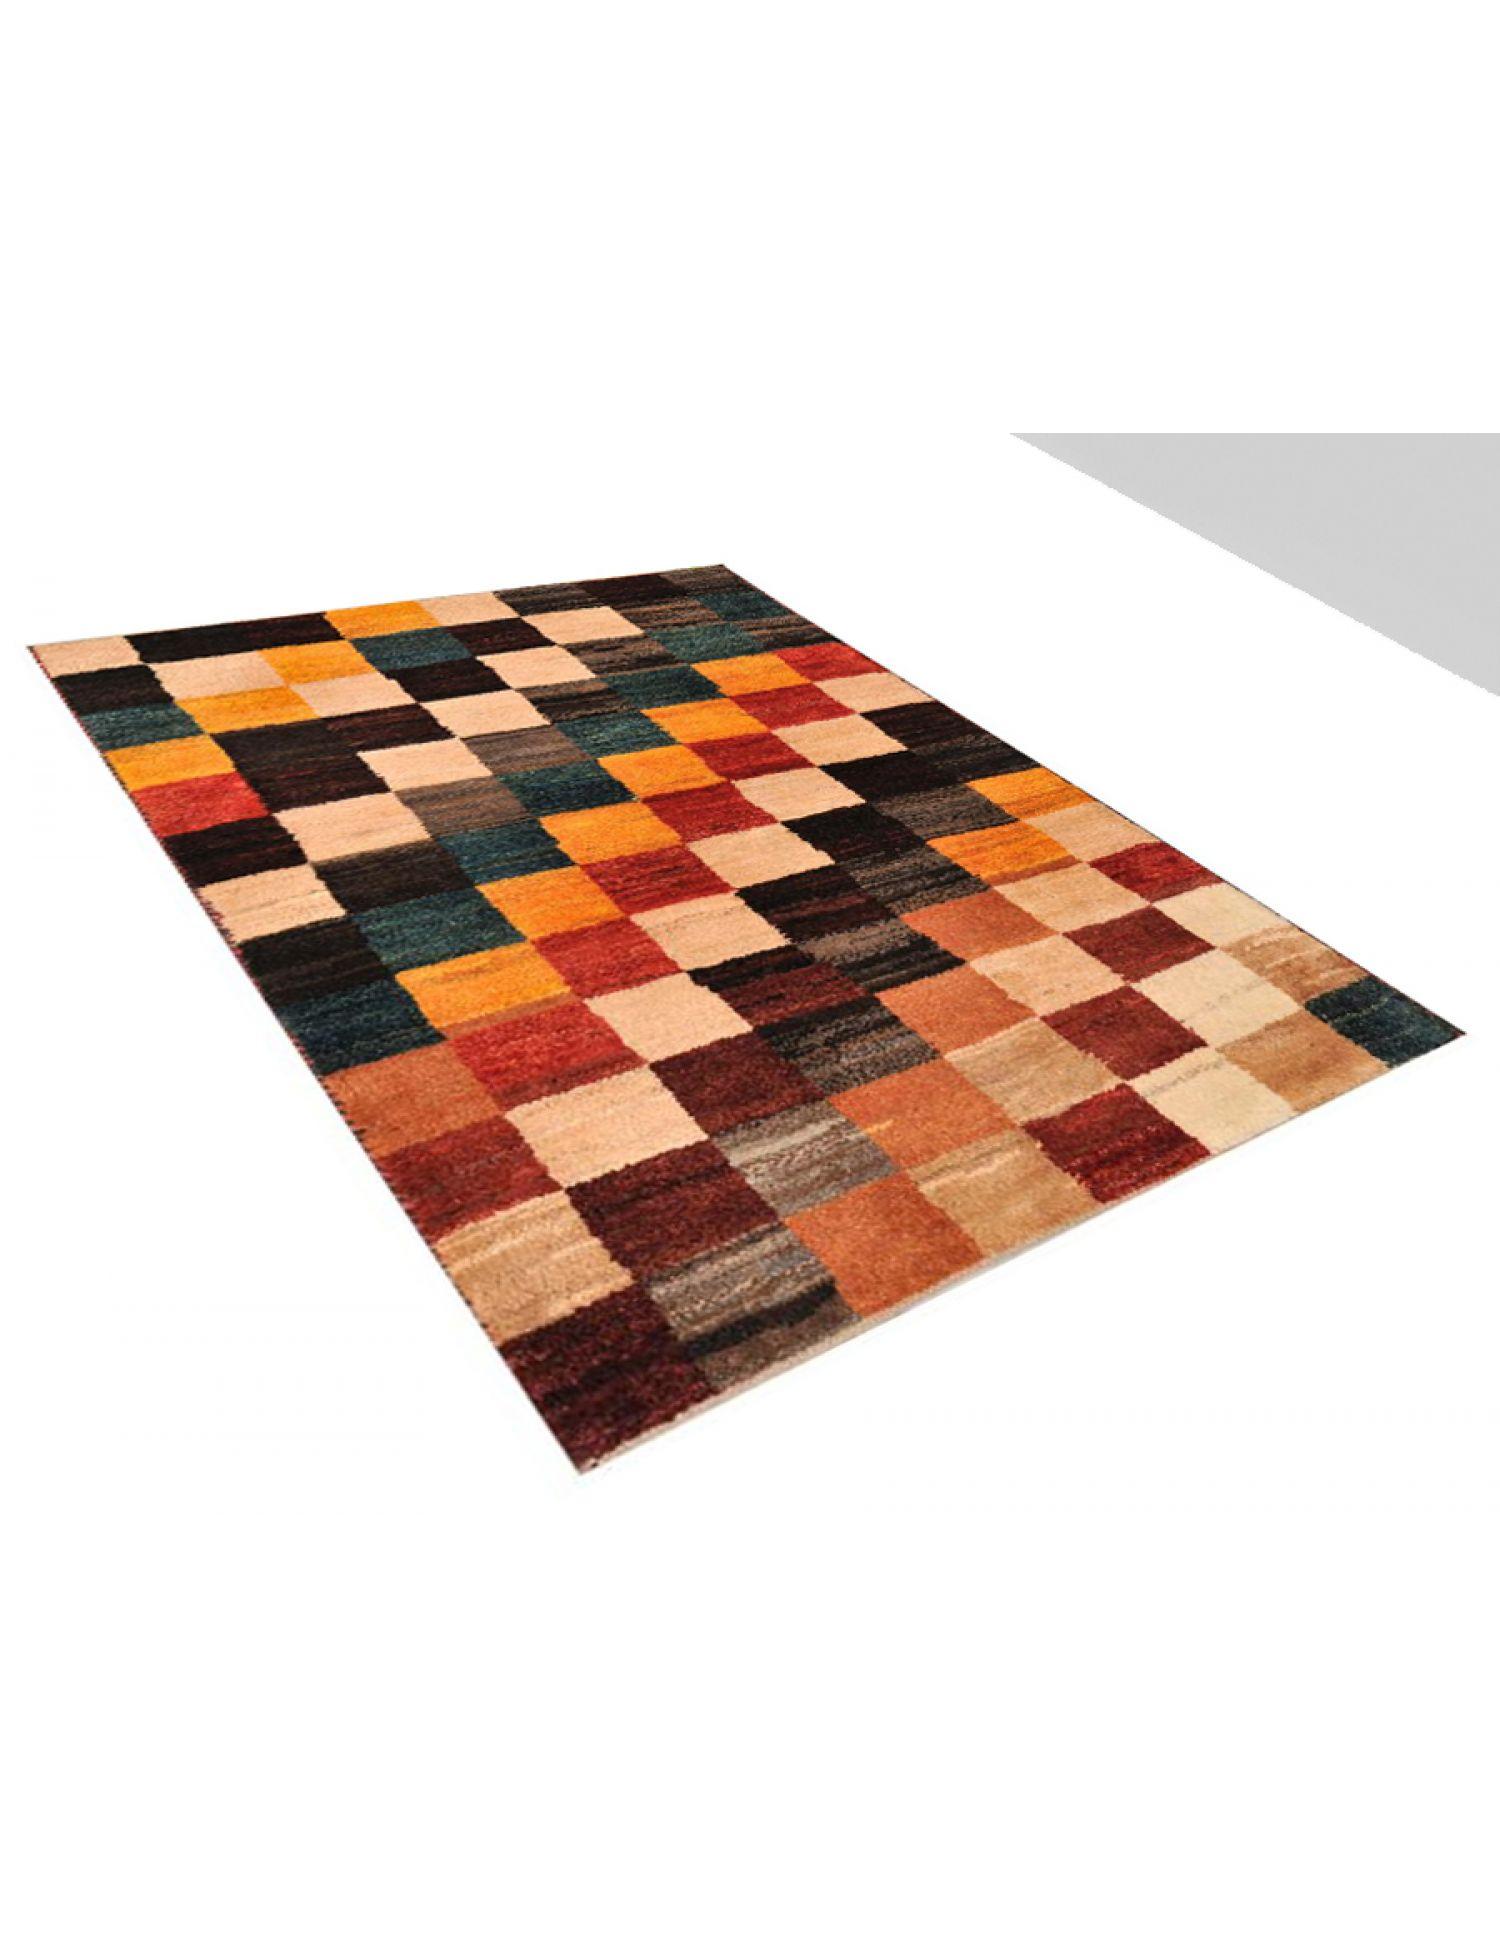 Moderne Teppiche  mehrfarbig <br/>120 x 78 cm